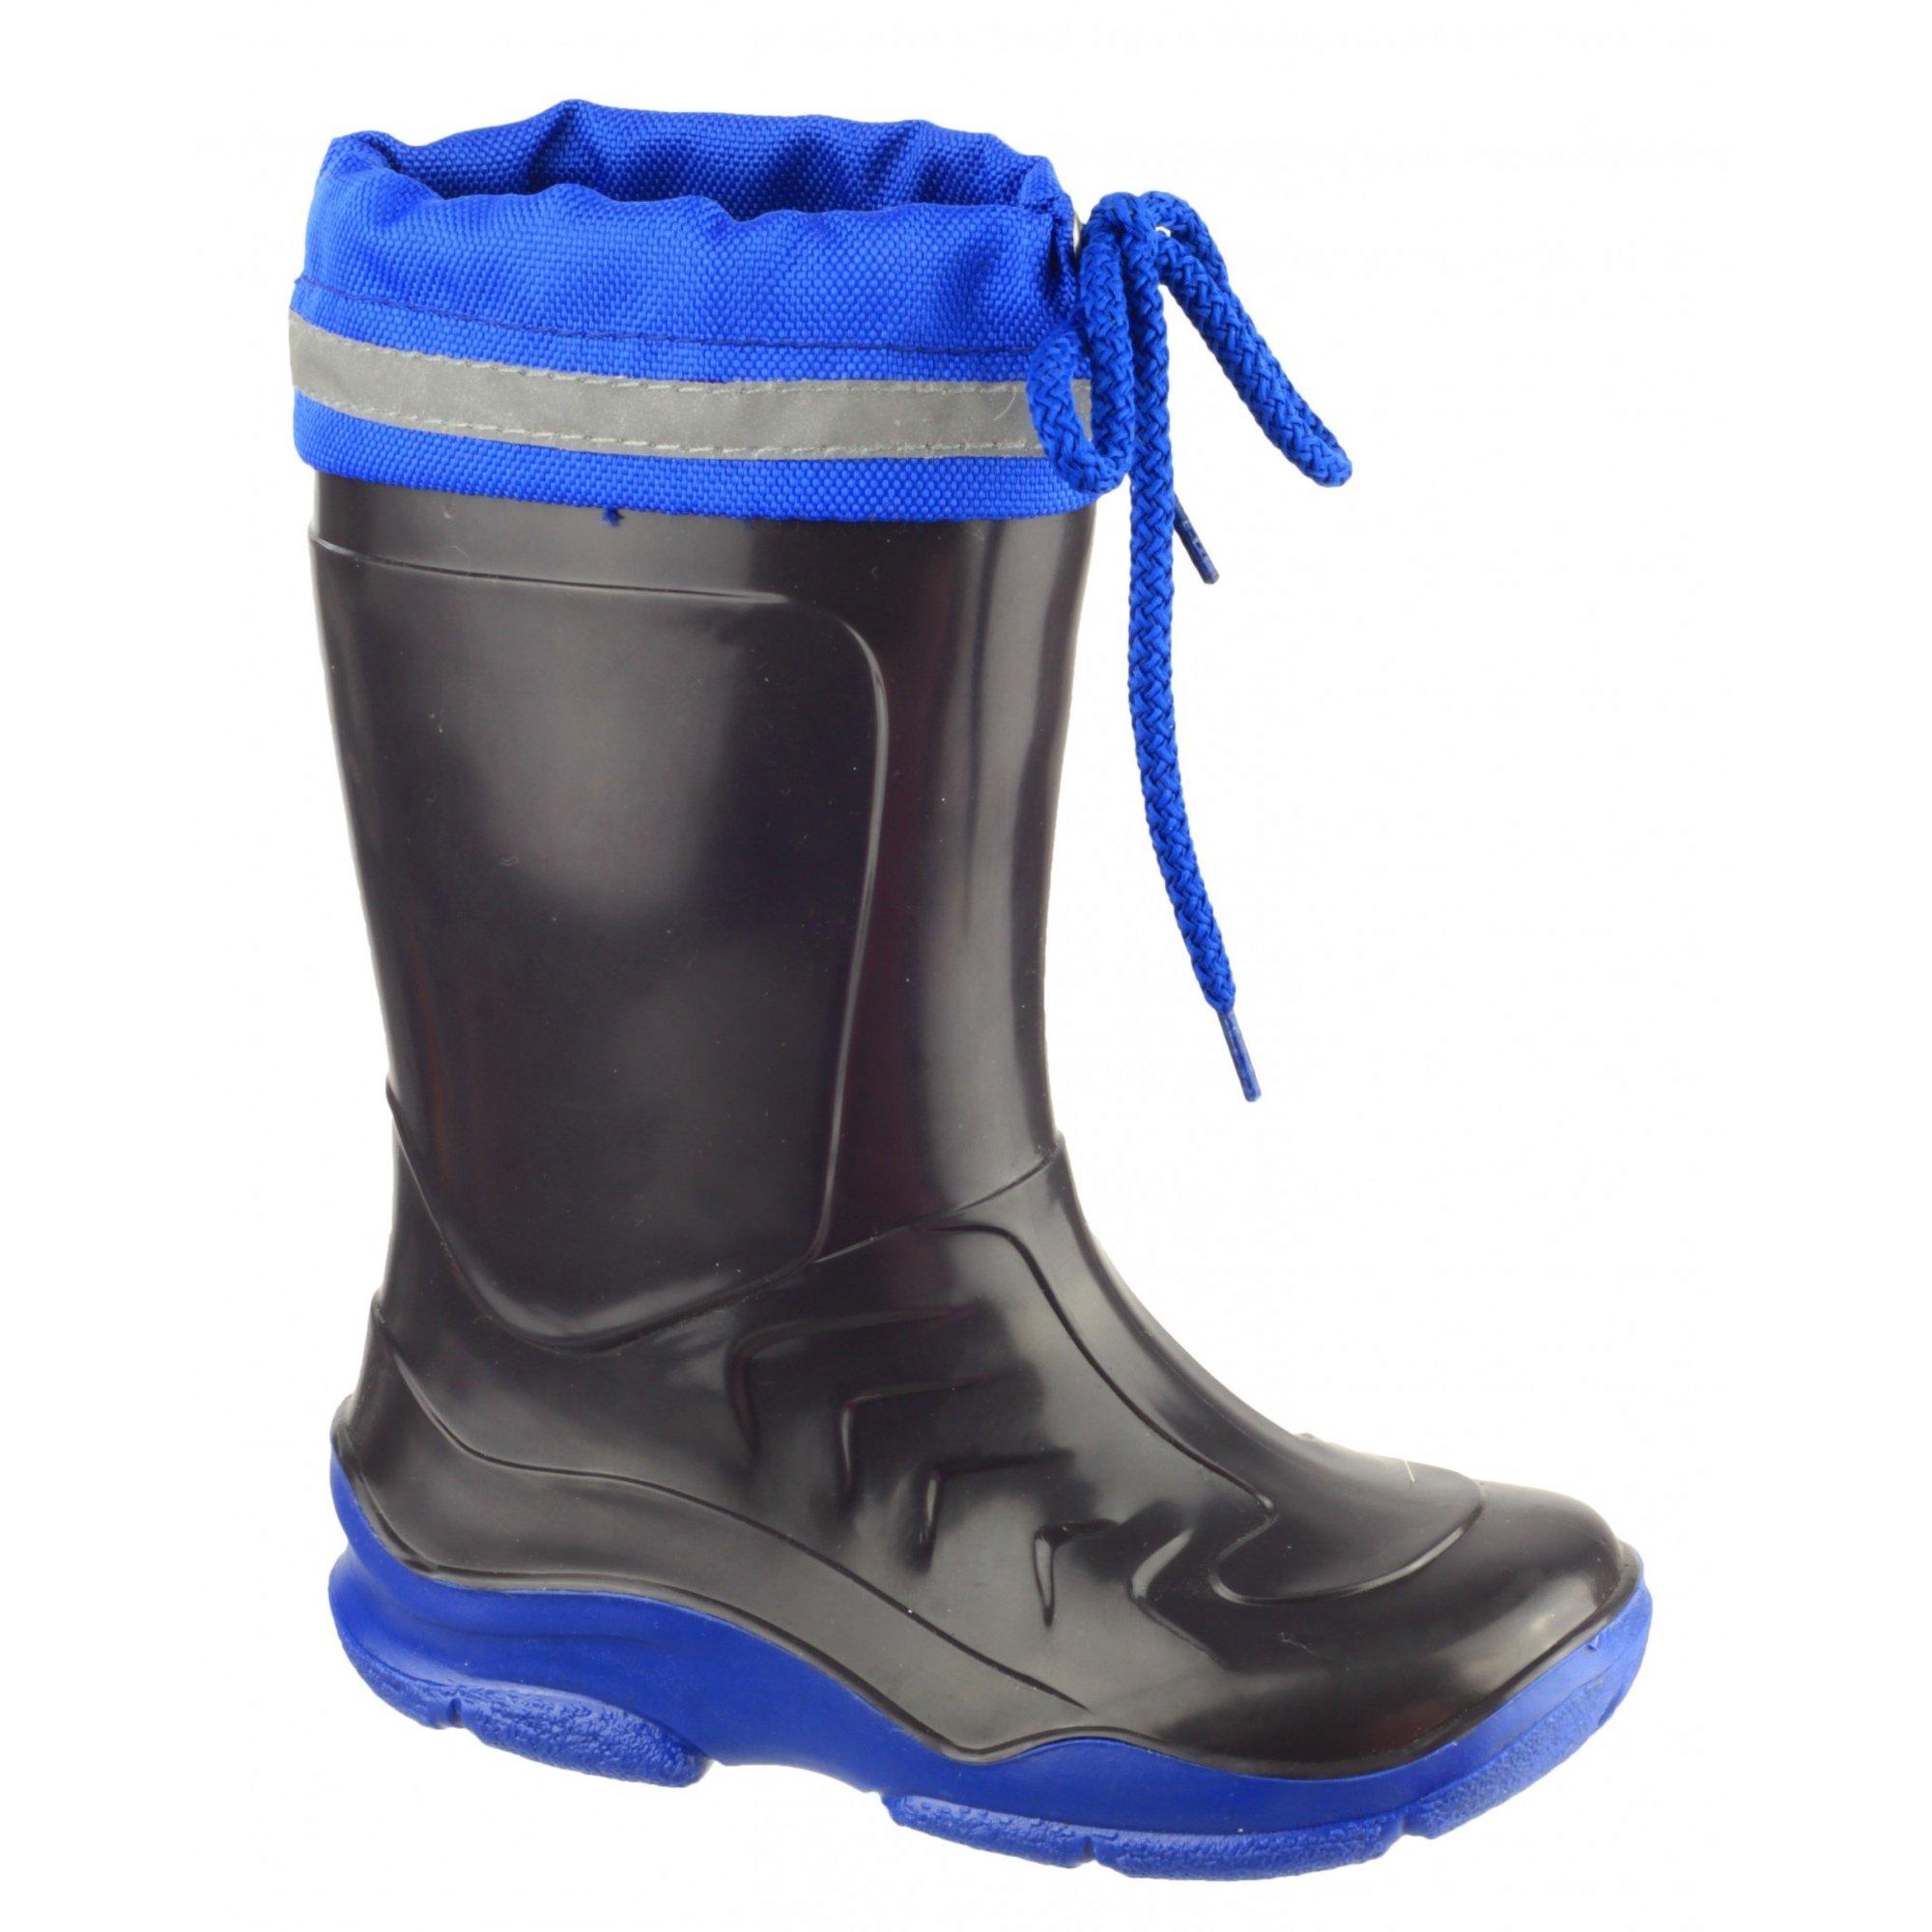 Mirak Splash Childrens Warmlined Boot/Boys Waterproof Boots (2.5-3 US Youth) (Blue)